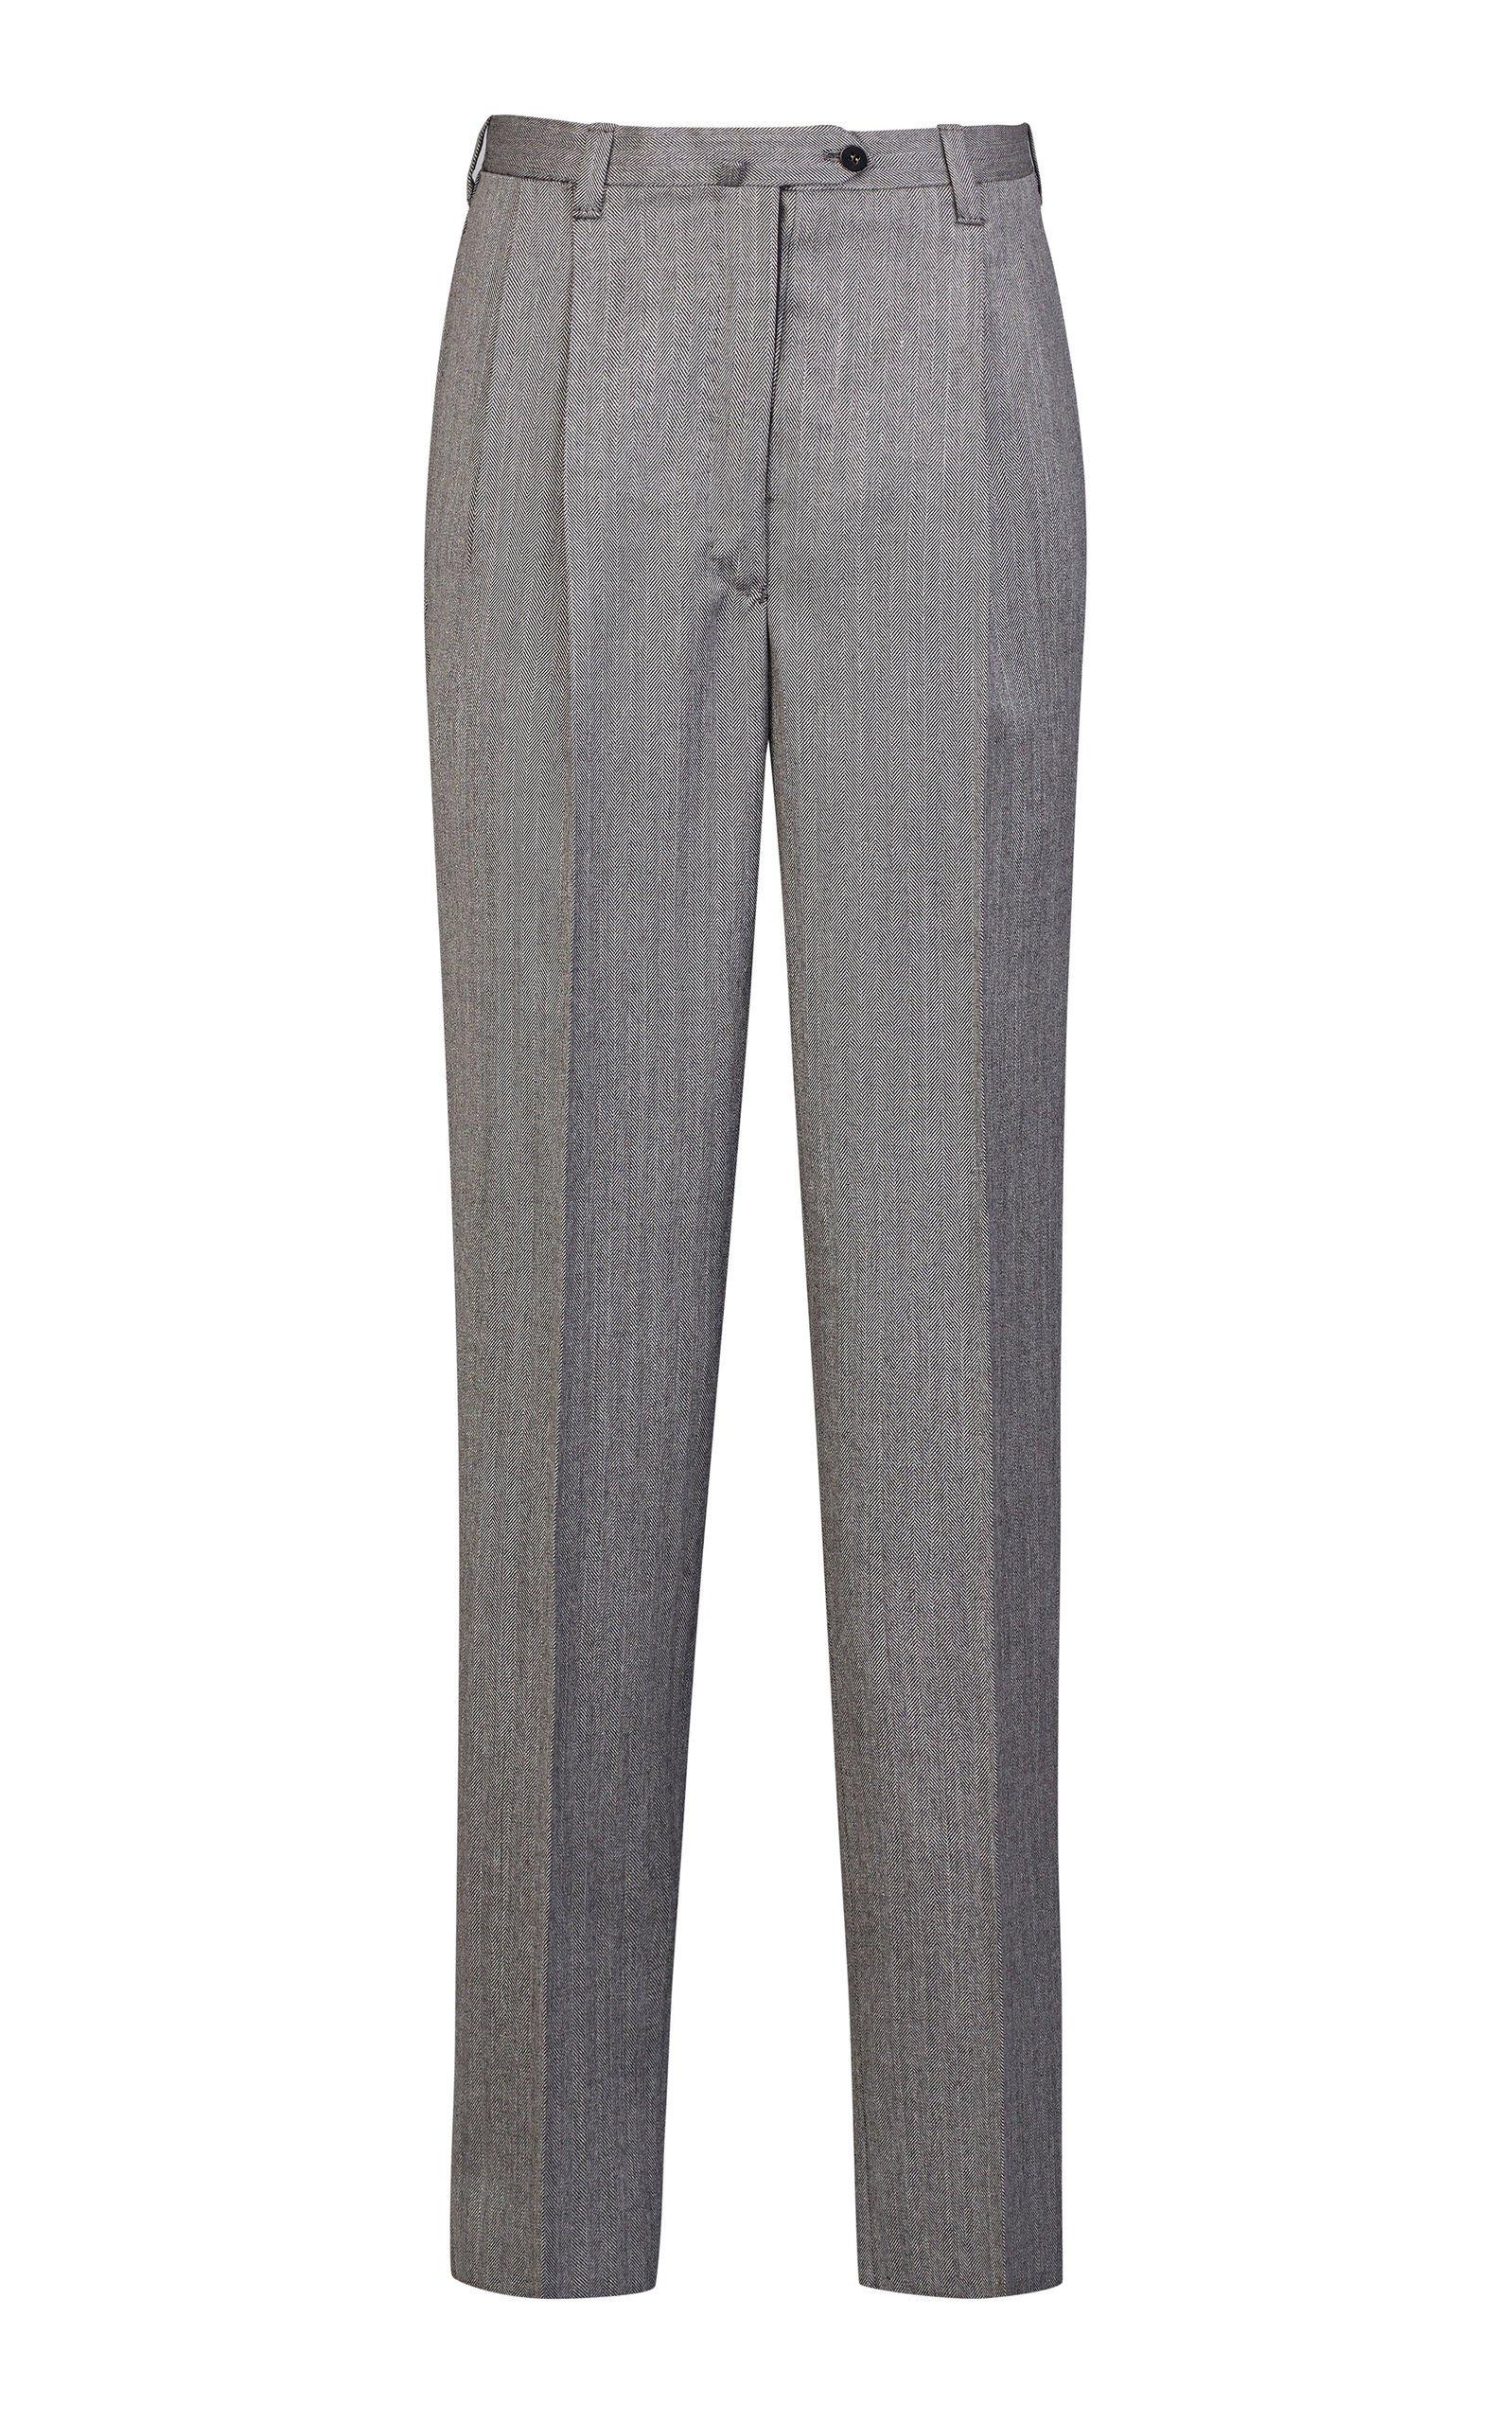 Giuliva Heritage Collection Cornelia Tailored Herringbone Wool Straight-Leg Pants